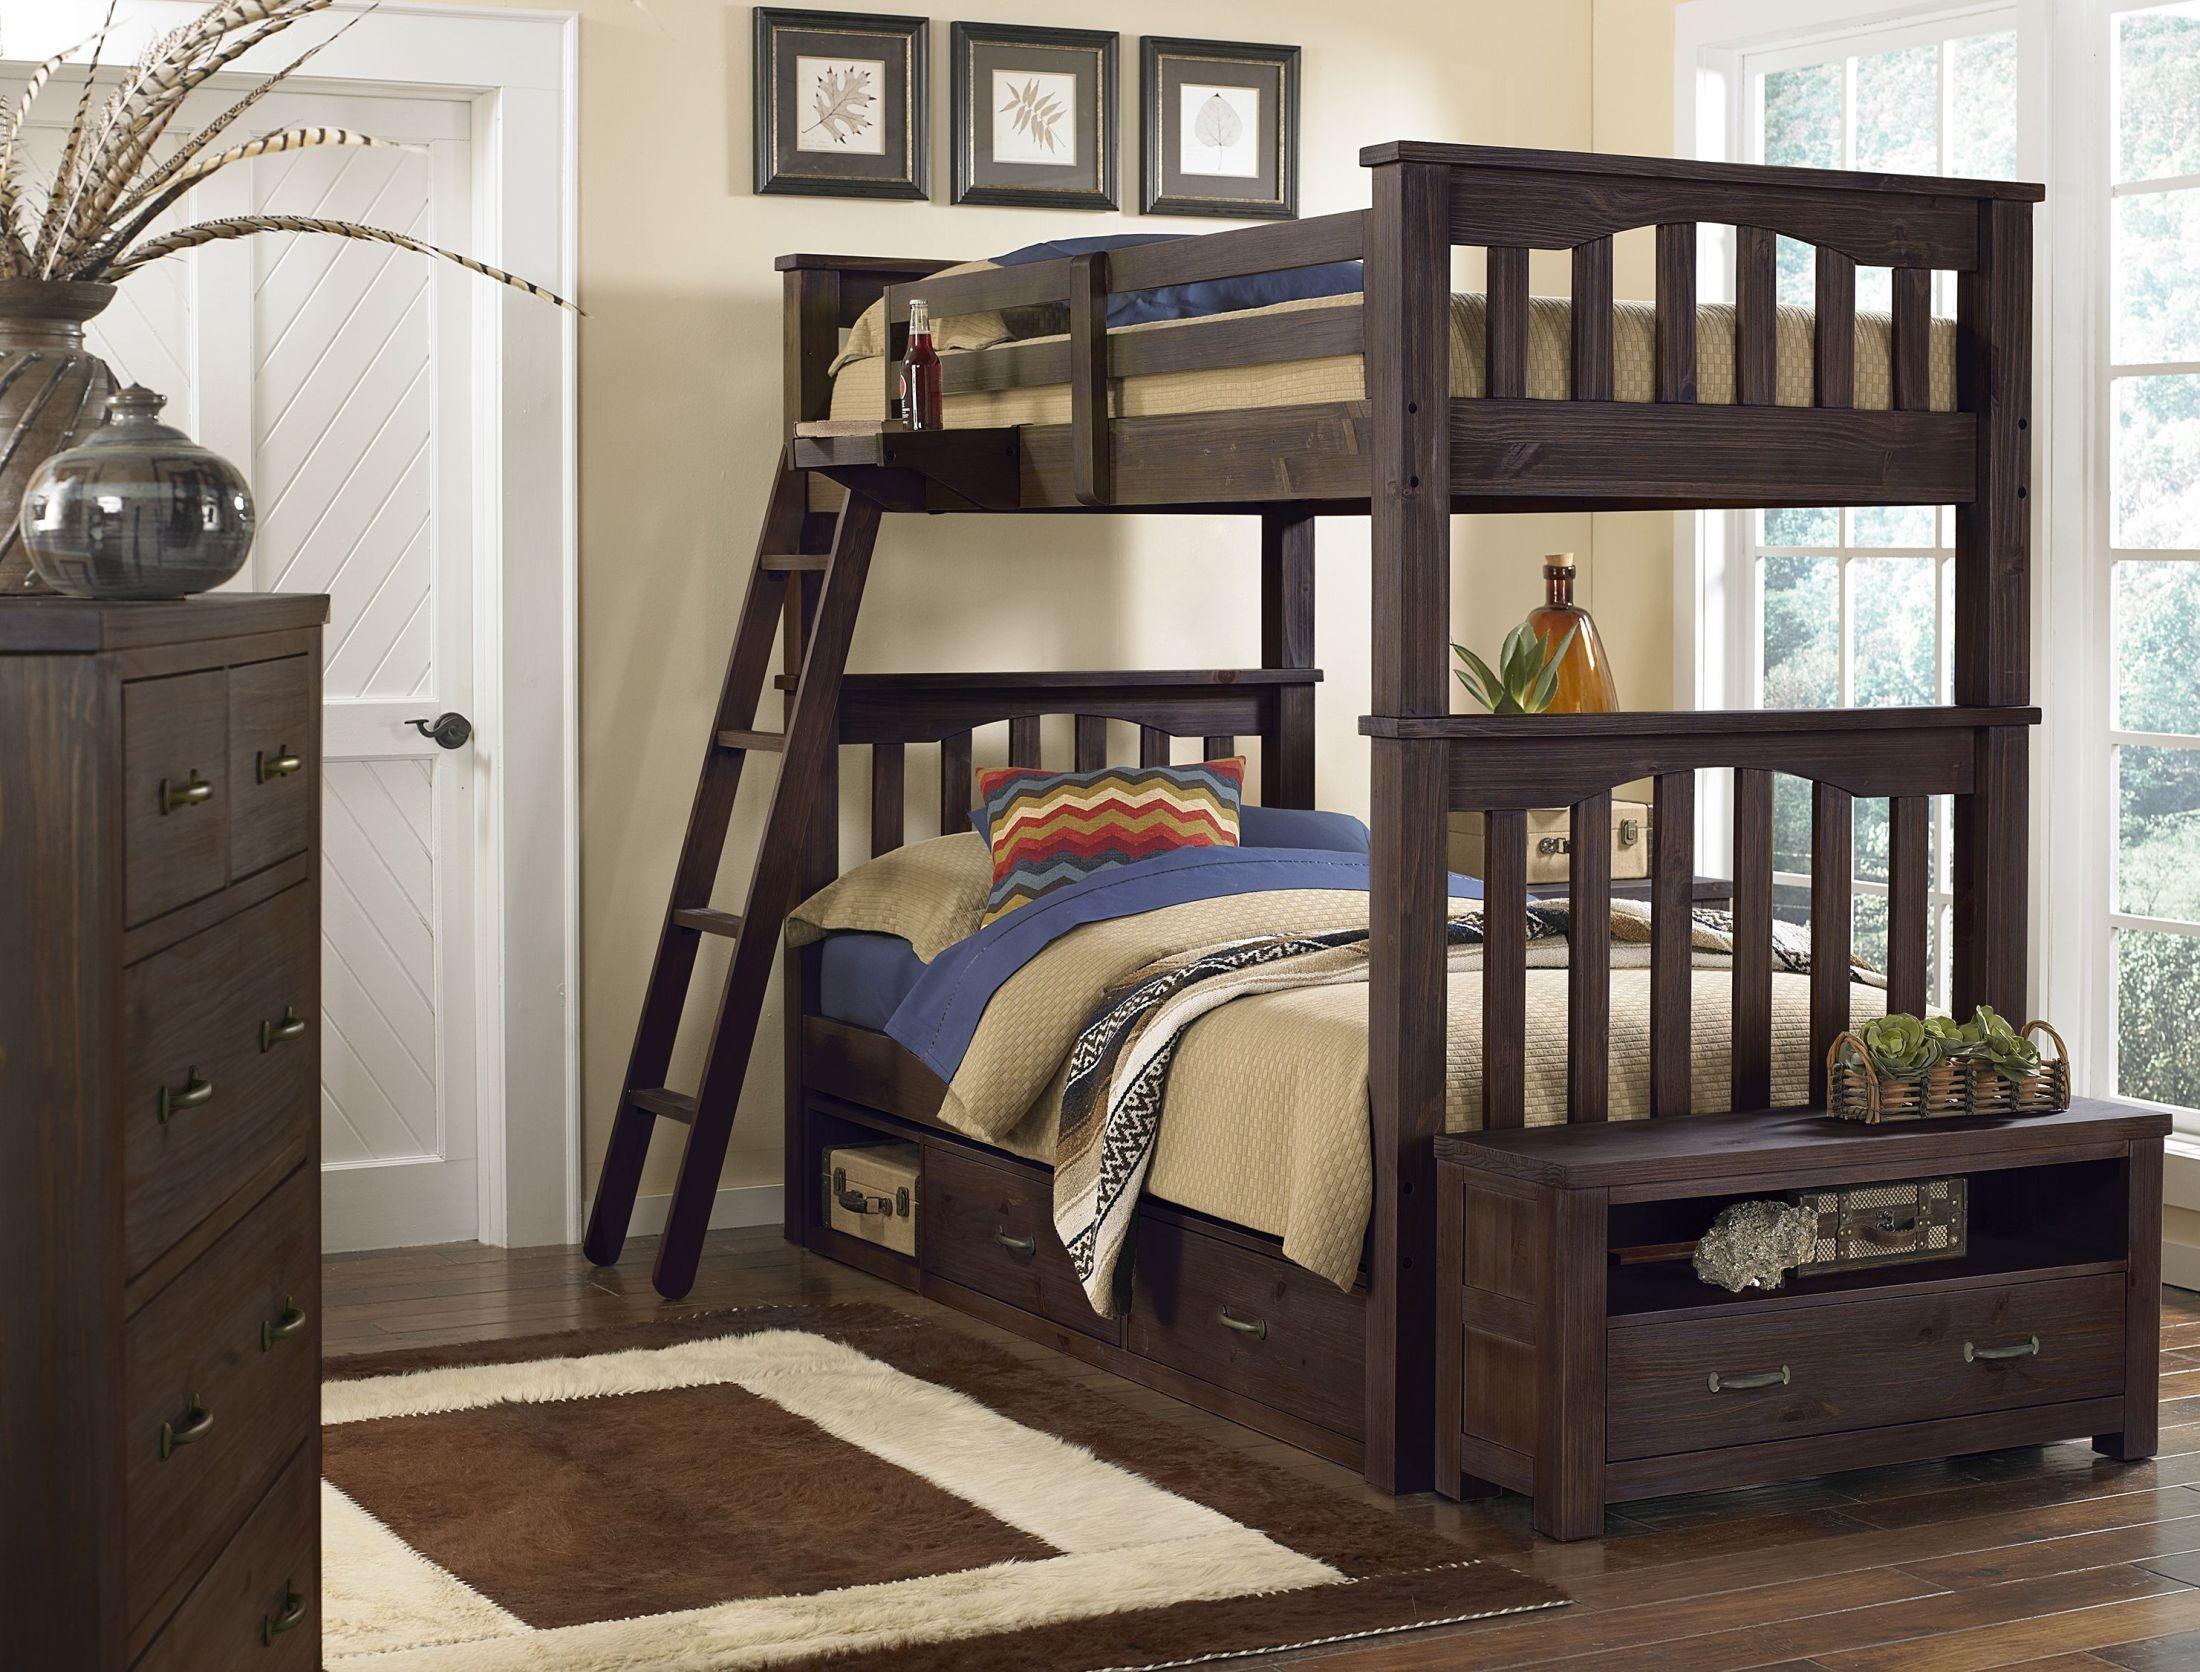 Highlands harper espresso youth storage bunk bedroom set - Youth bedroom furniture with storage ...